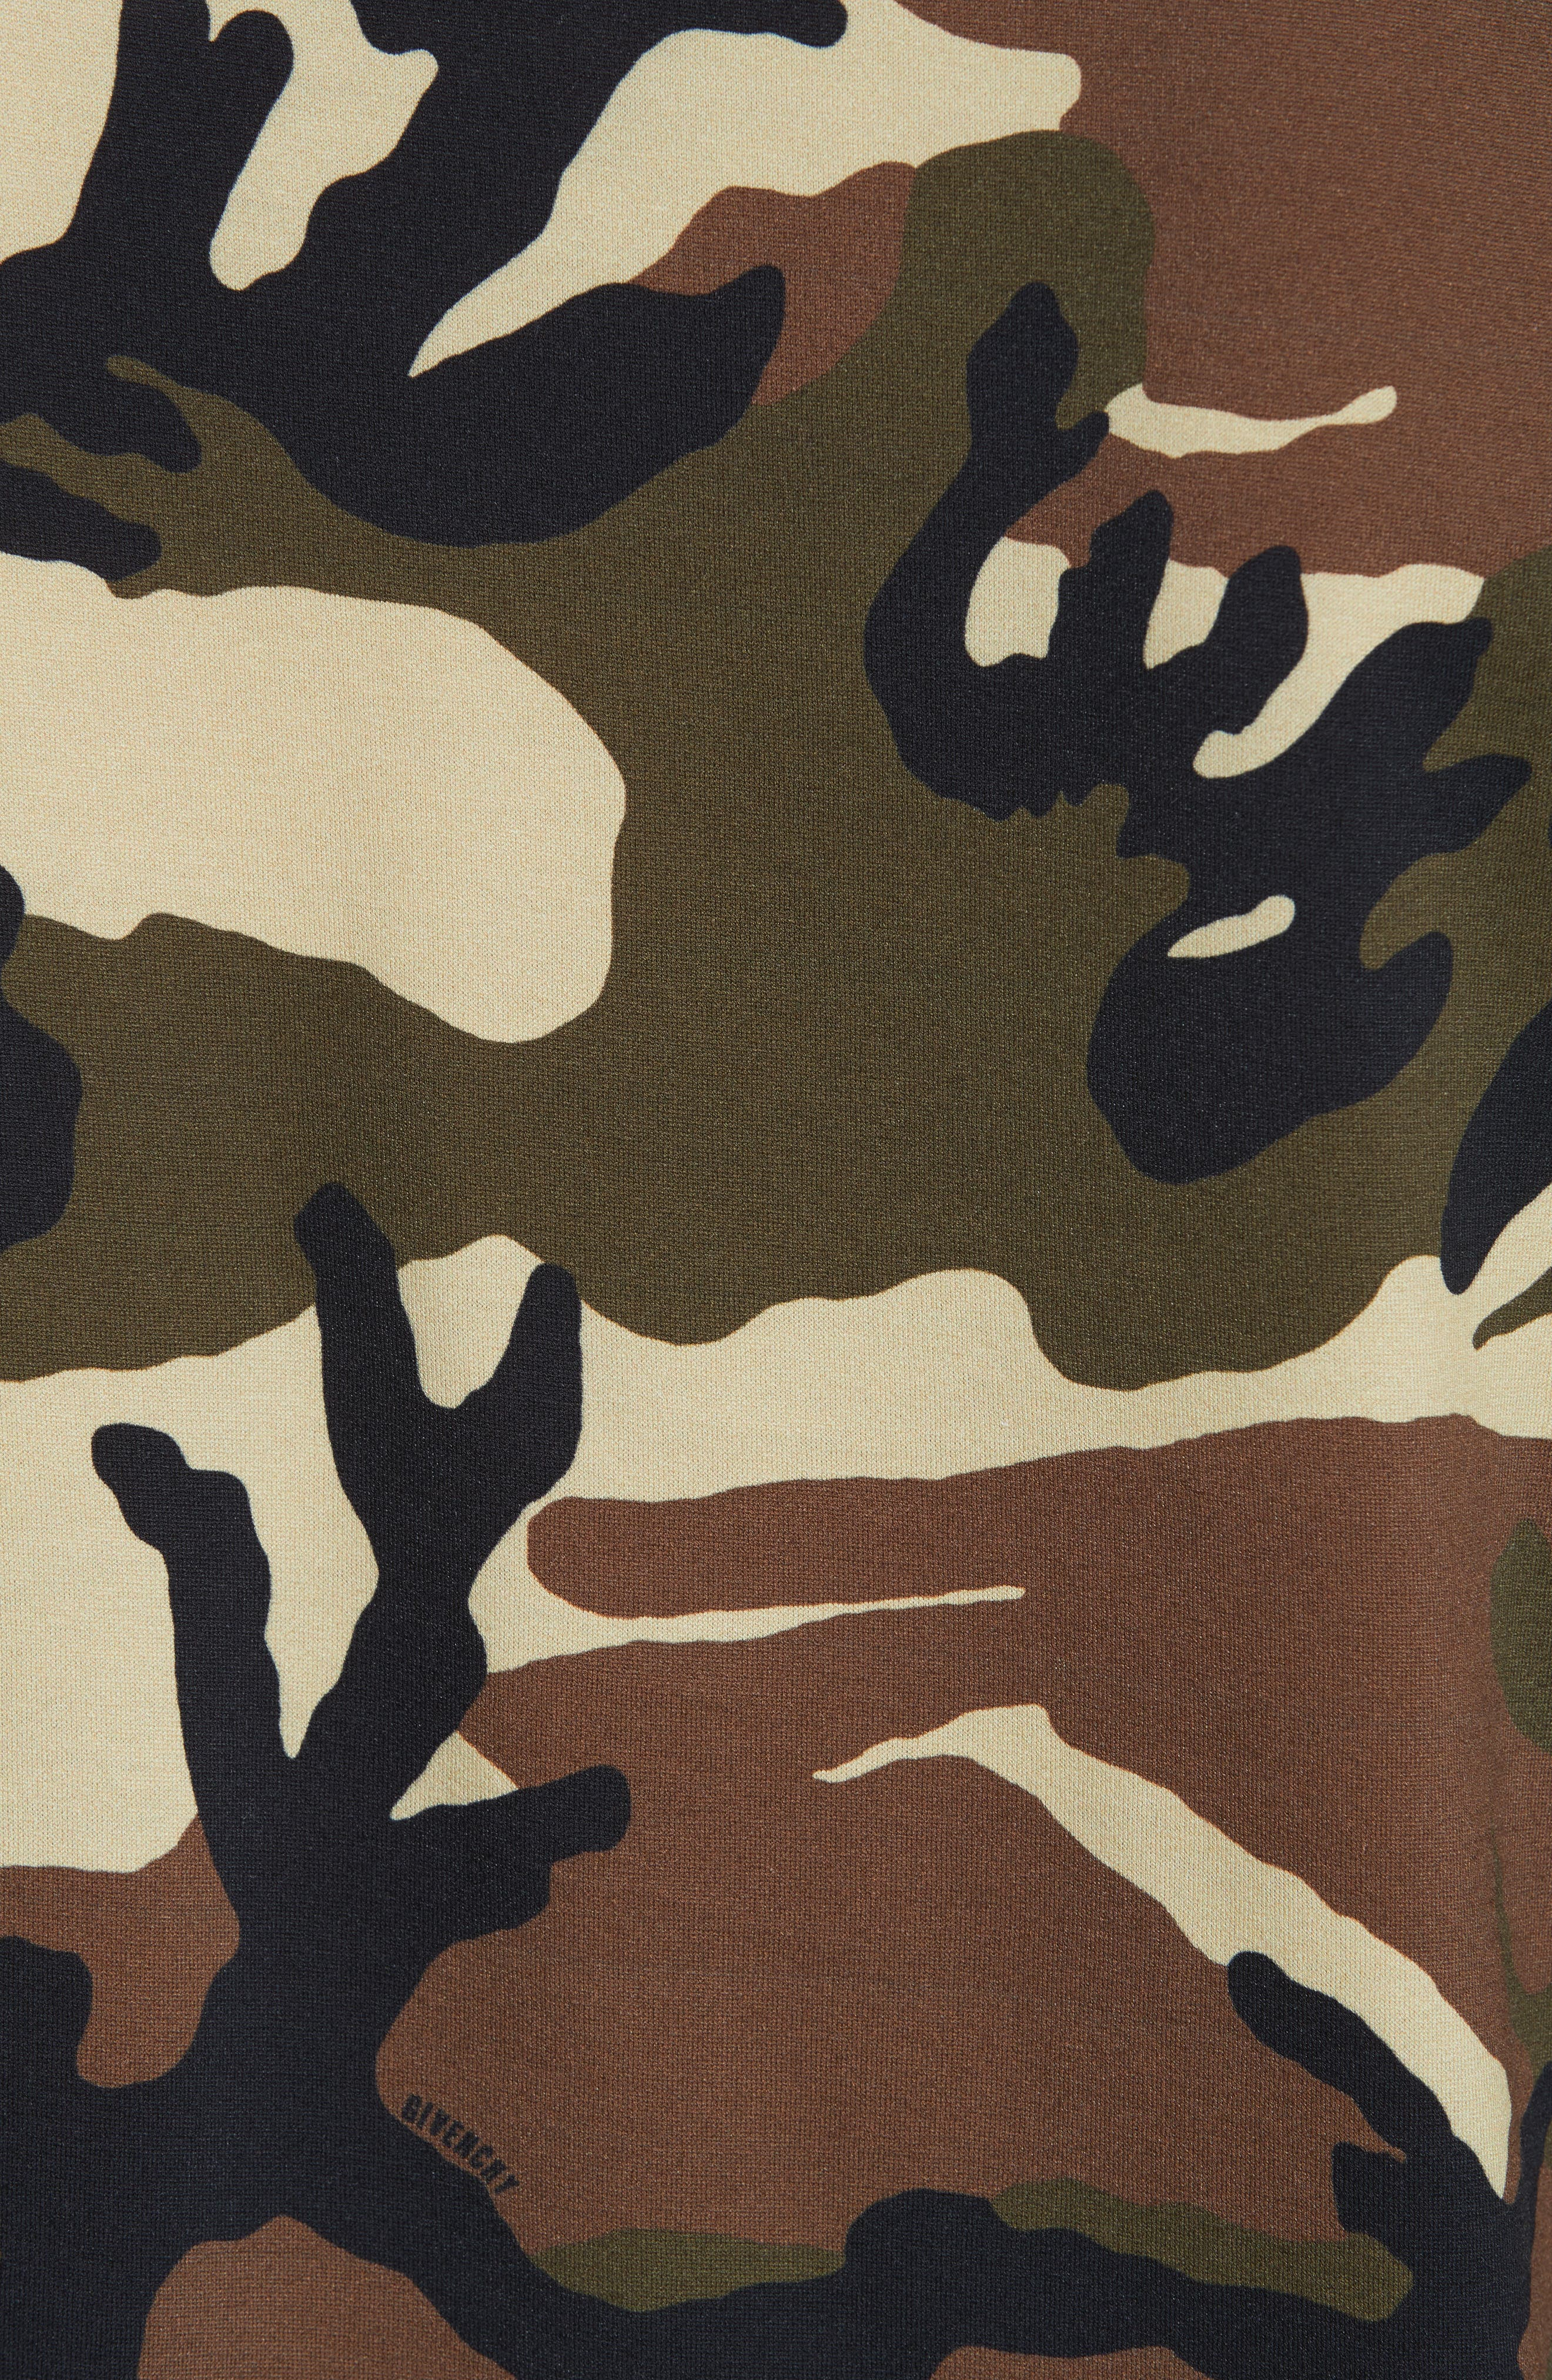 Extra Trim Fit Camo Print T-Shirt,                             Alternate thumbnail 5, color,                             Camo